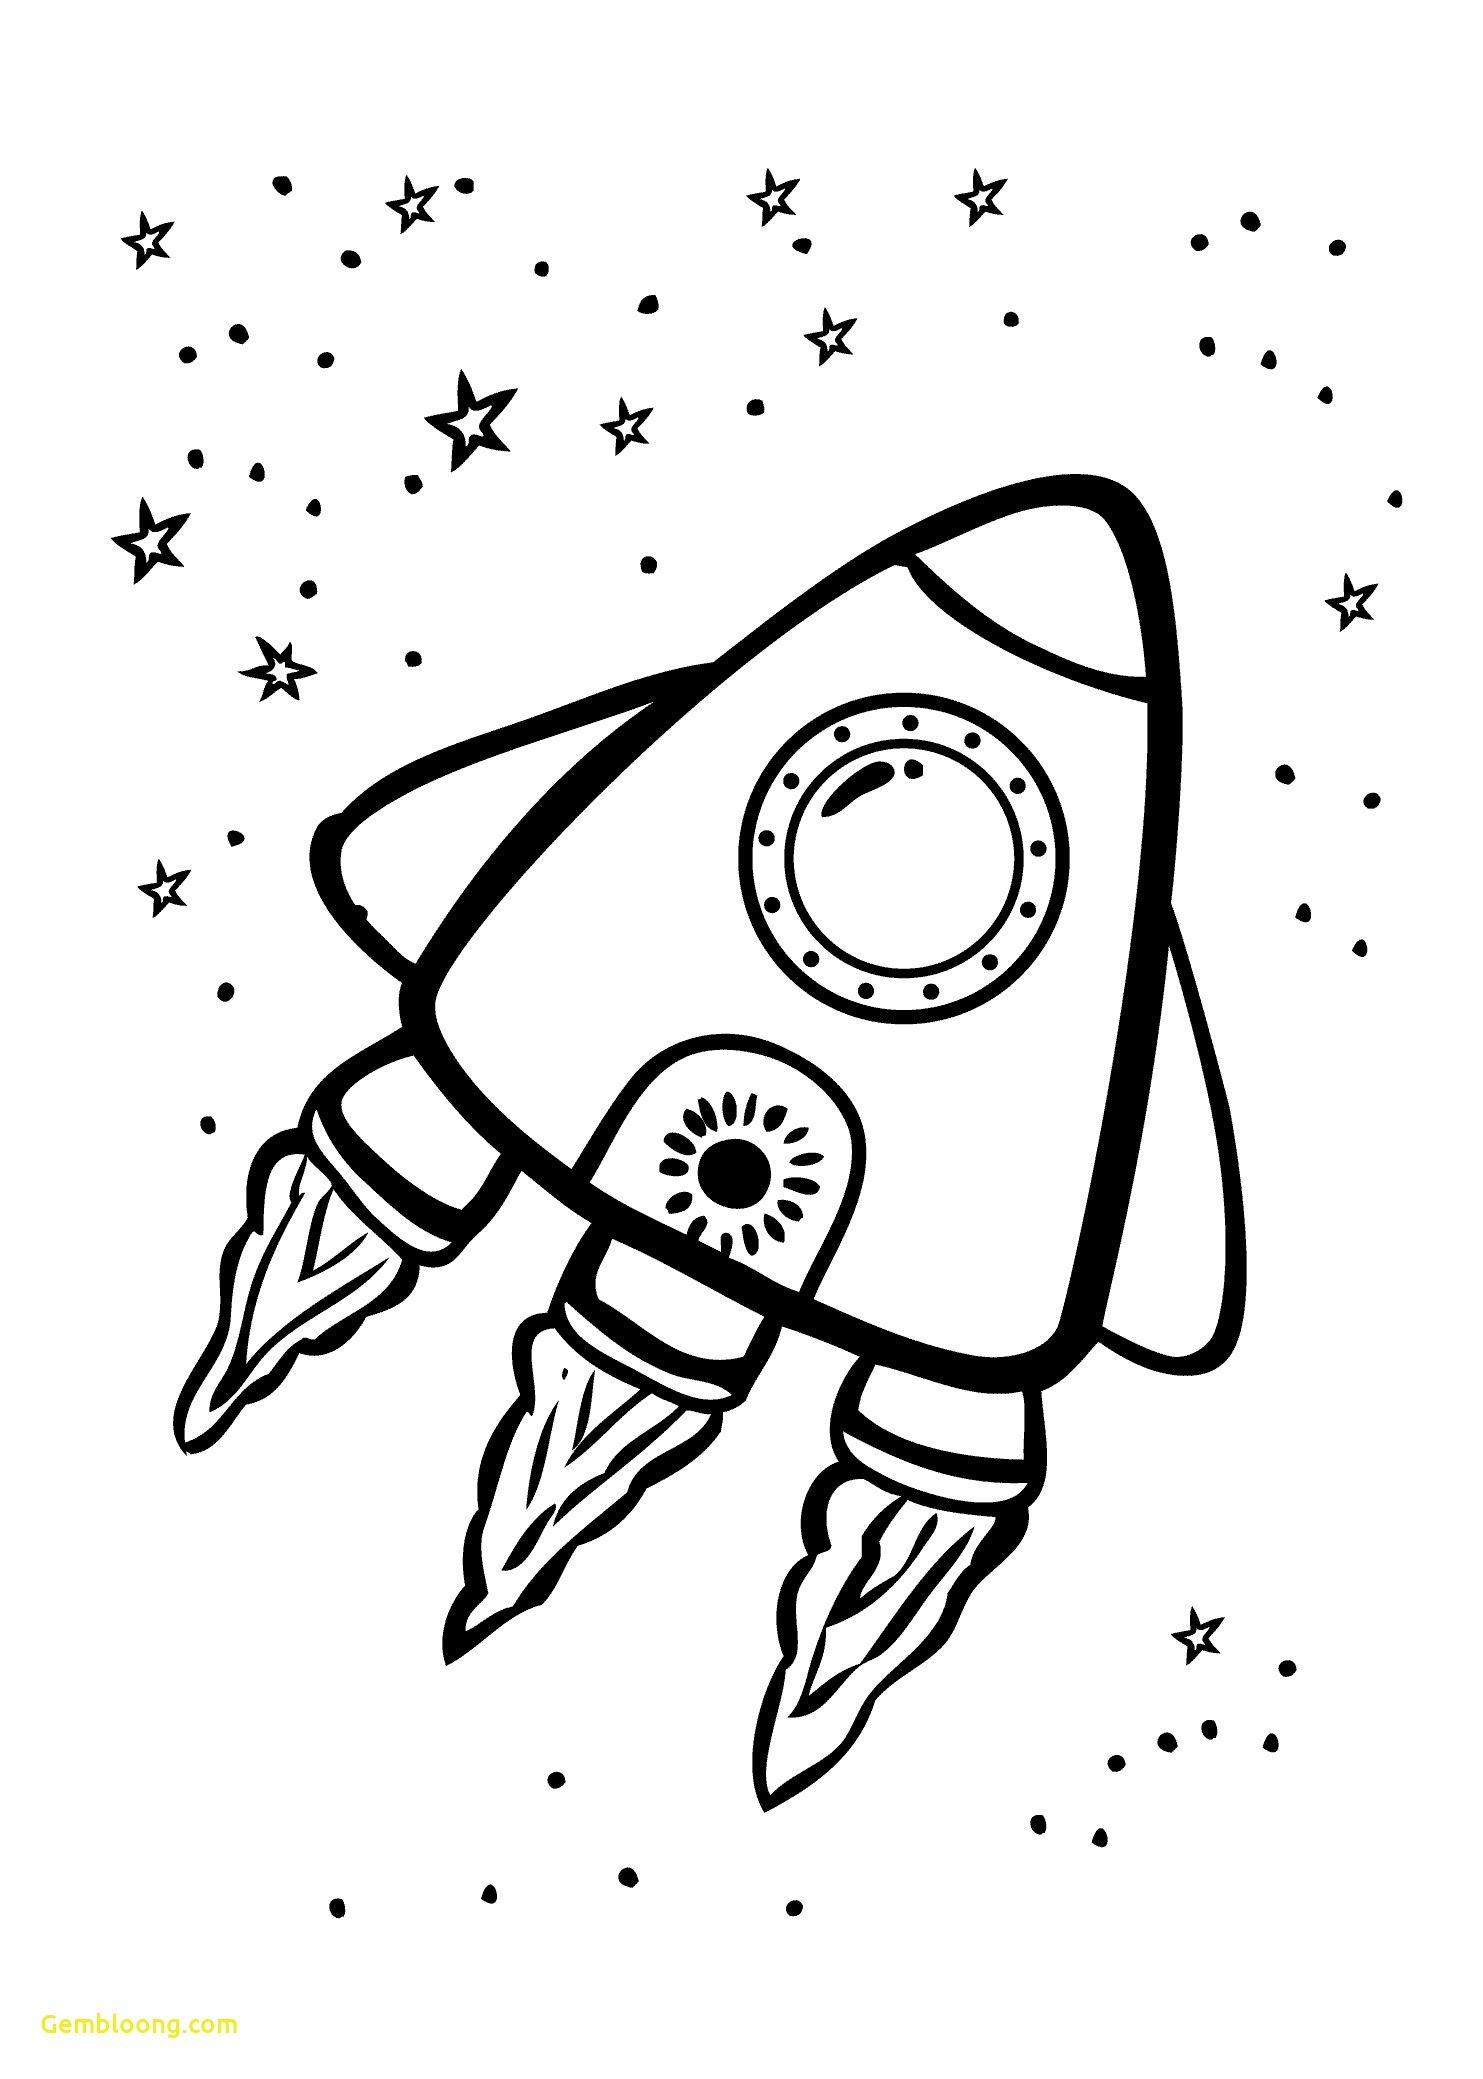 Readable Rocket Math Worksheets Addition Worksheet Printable Math Worksheets Rocket Math Addition Worksheets